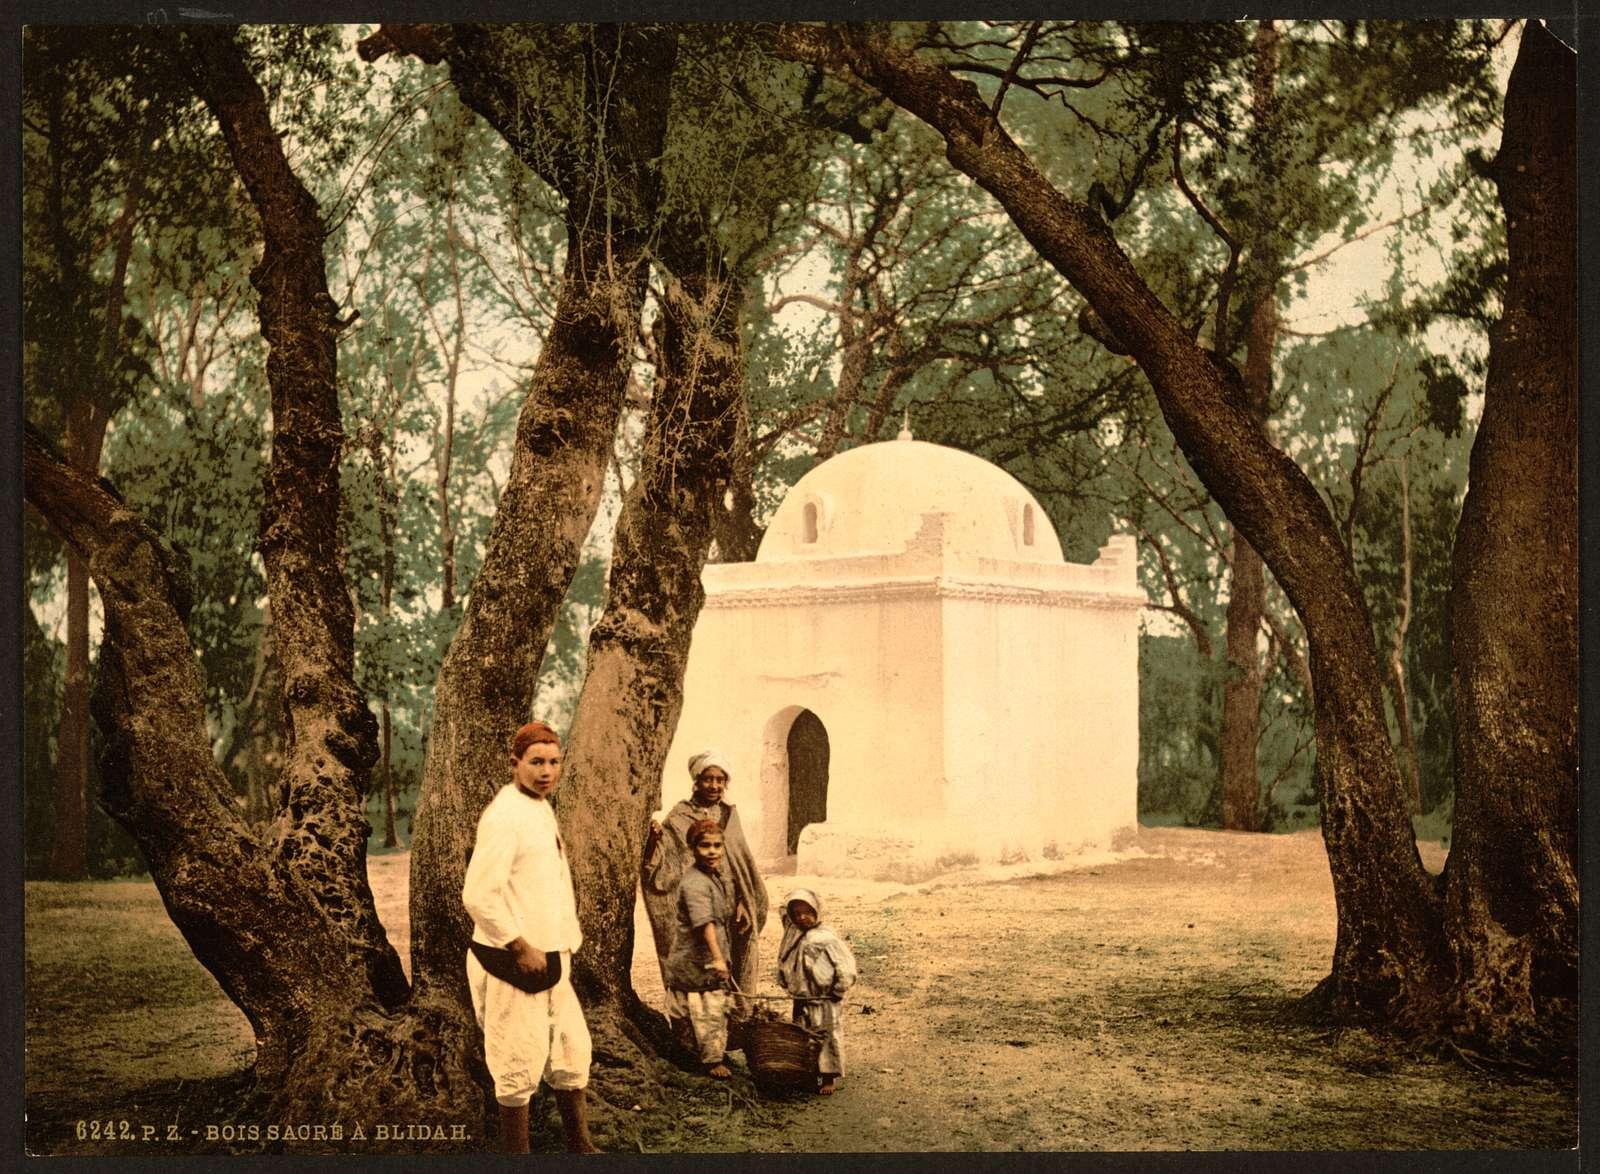 [The sacred wood, Blidah, Algeria]